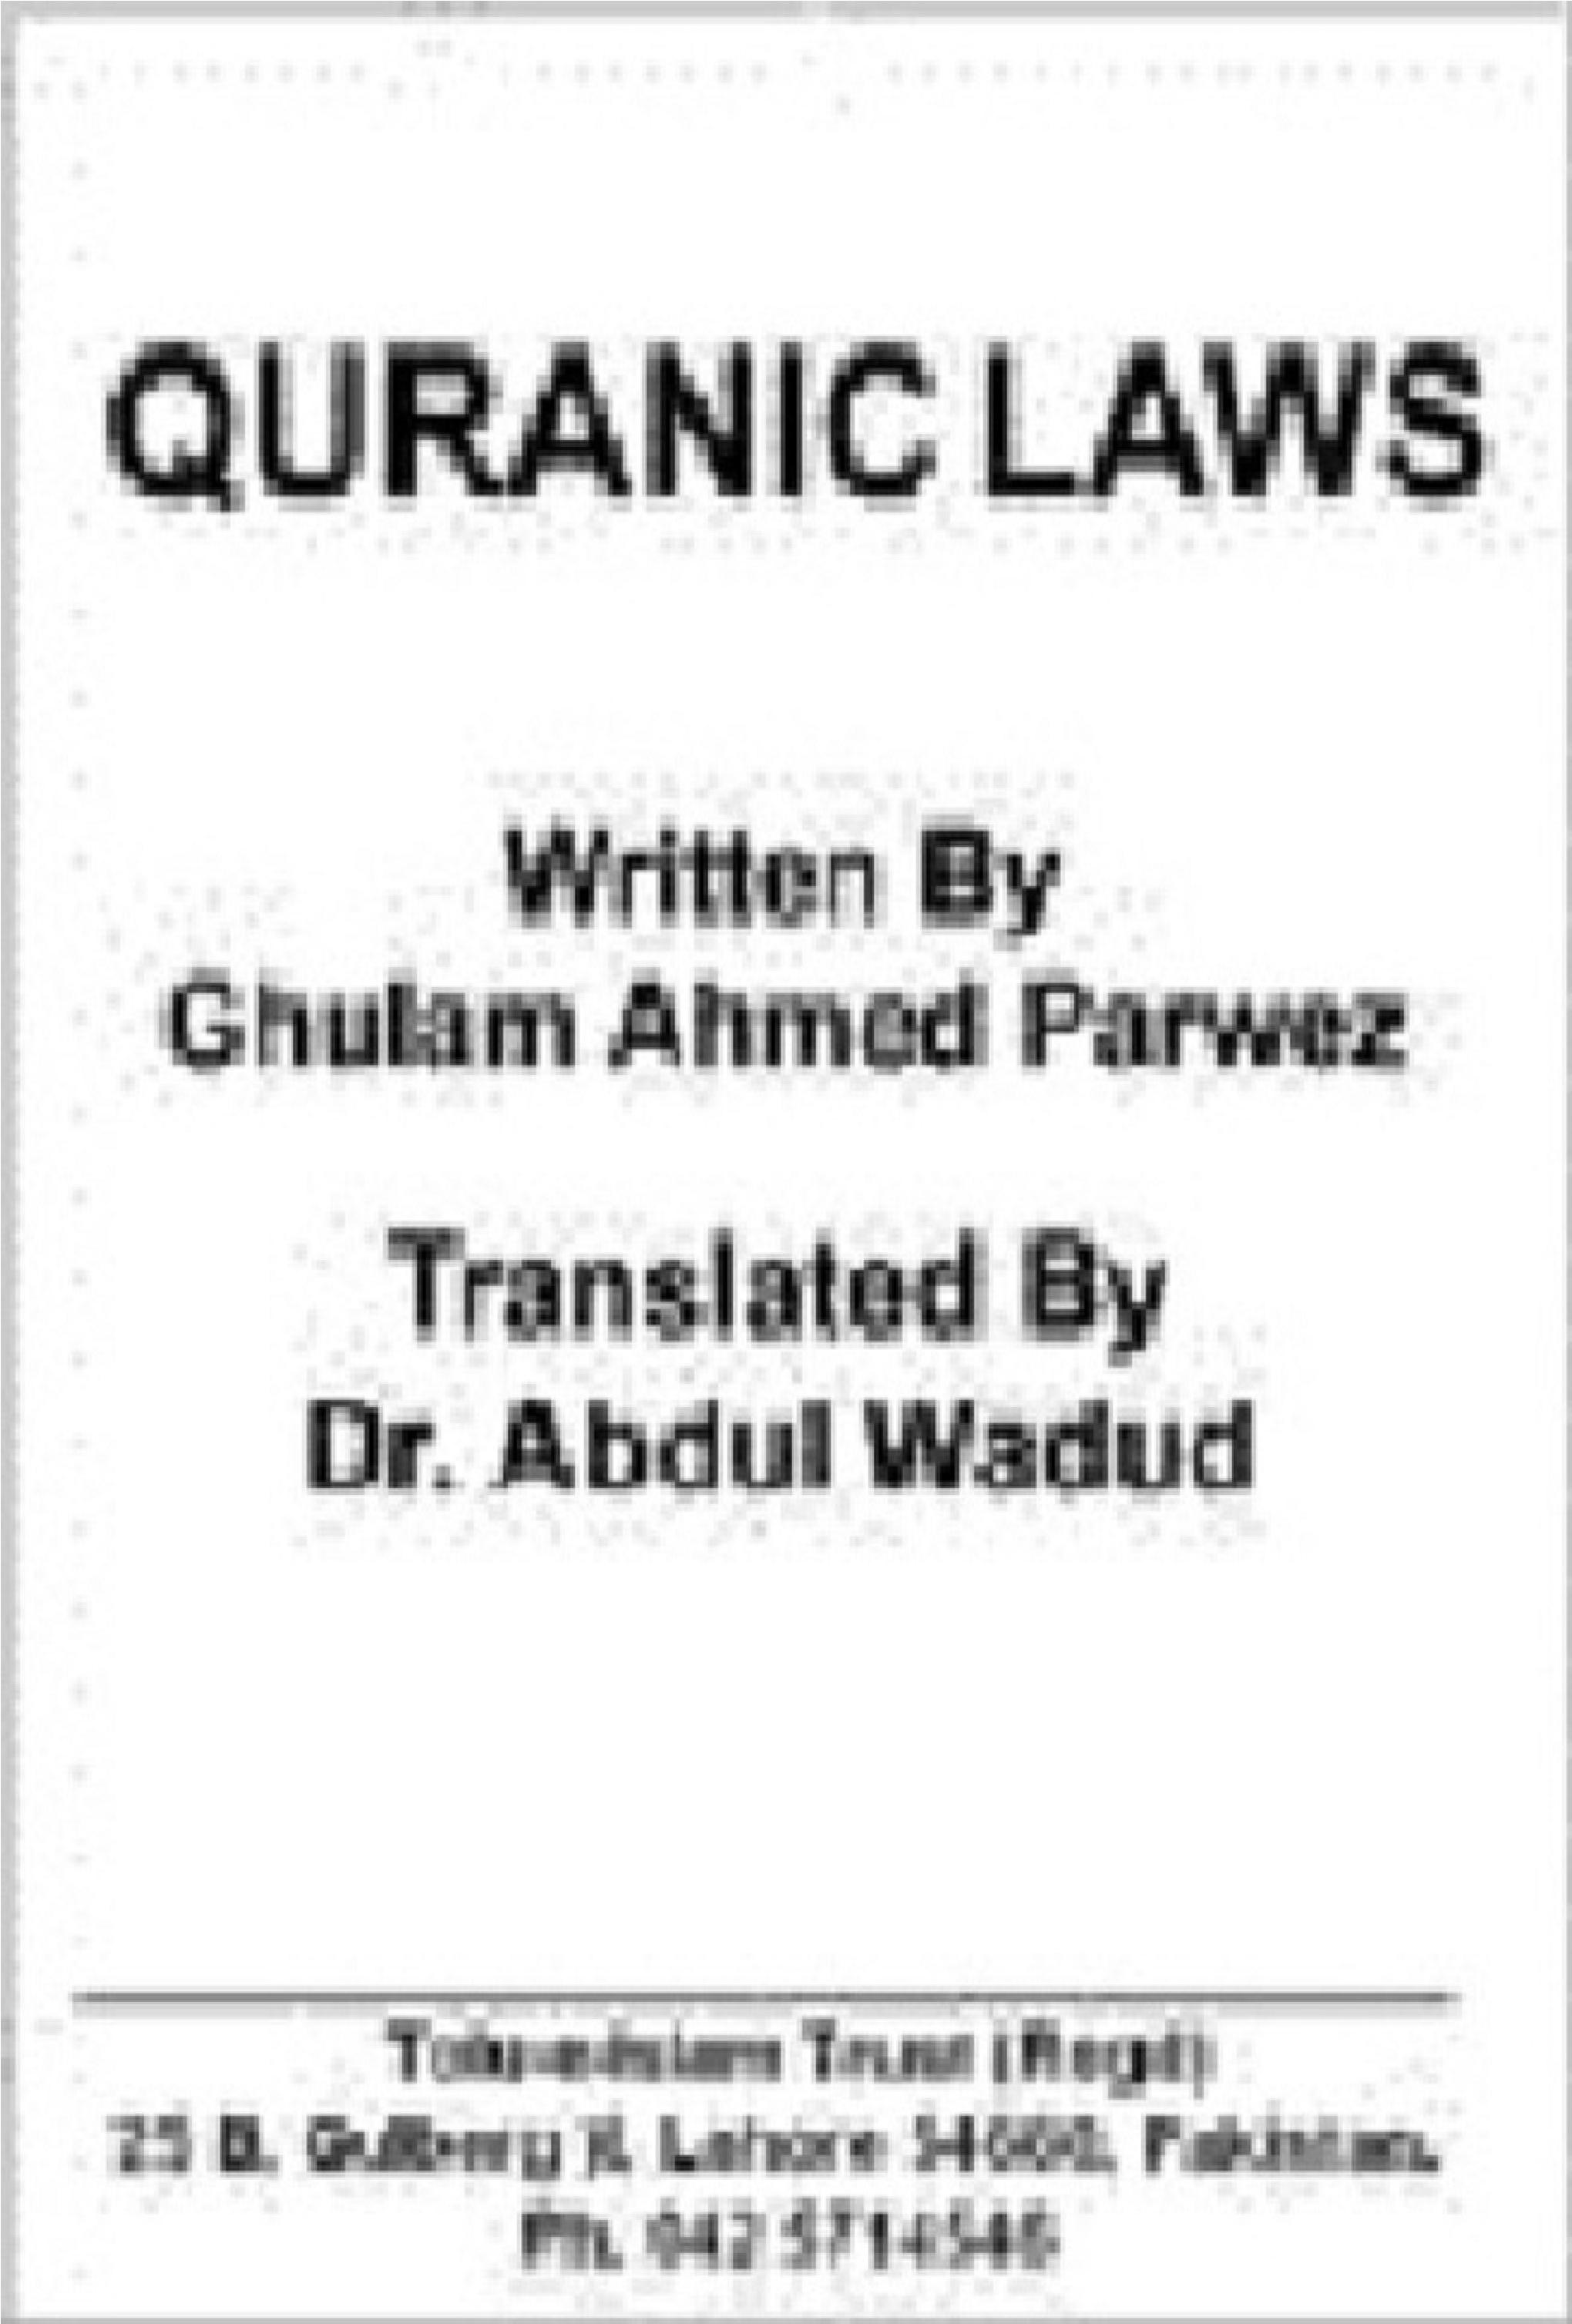 Quranic-Laws